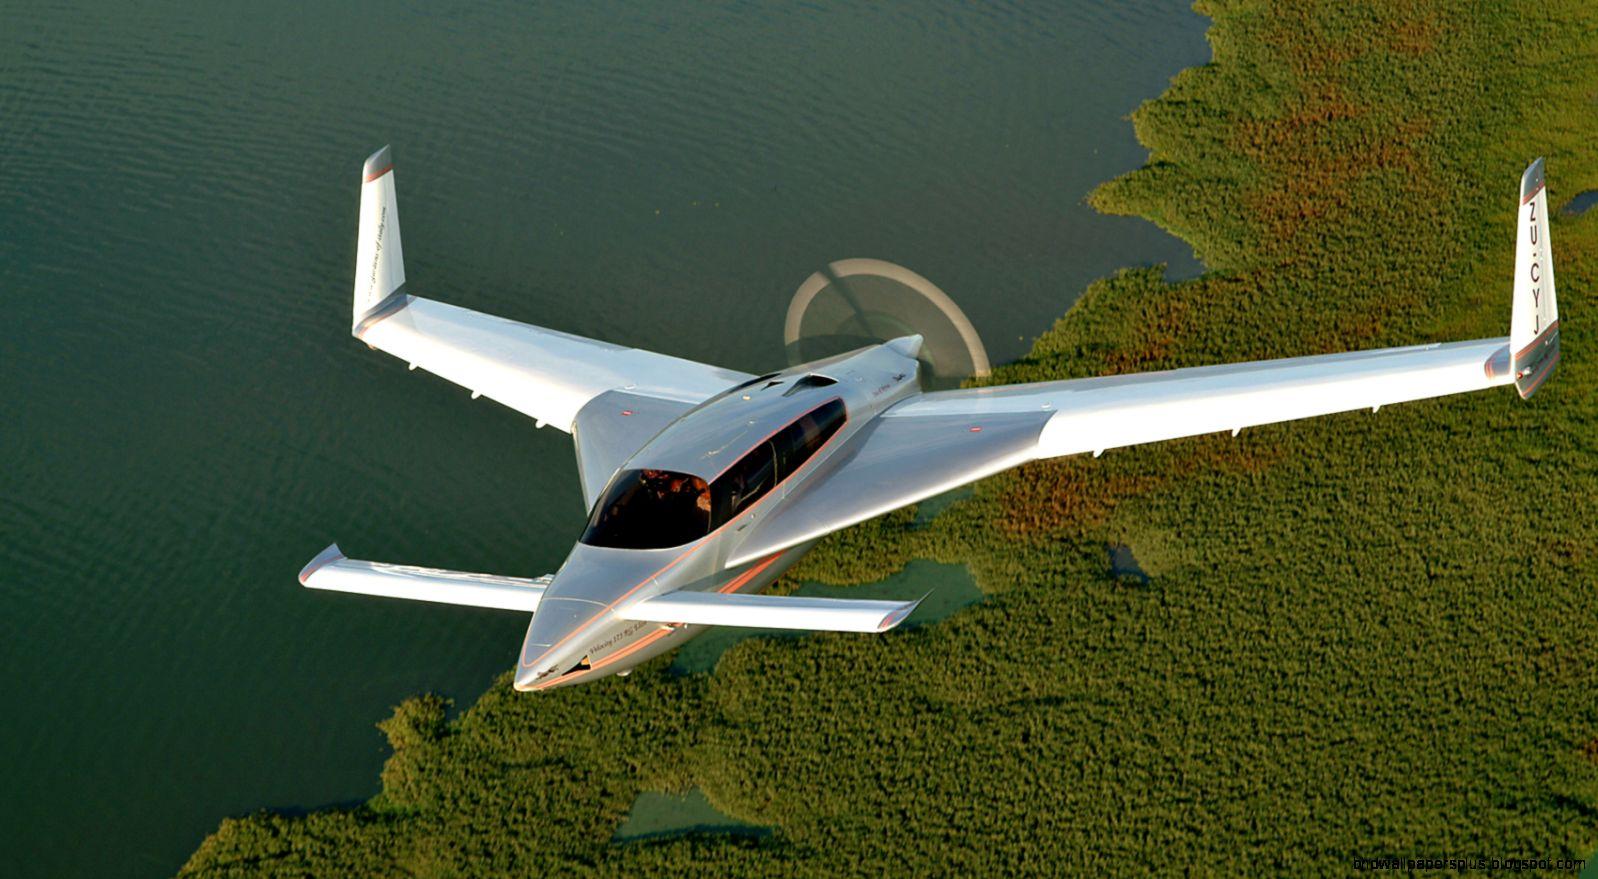 FileZu CYJ velocity   Velocity Aircraft Wiki